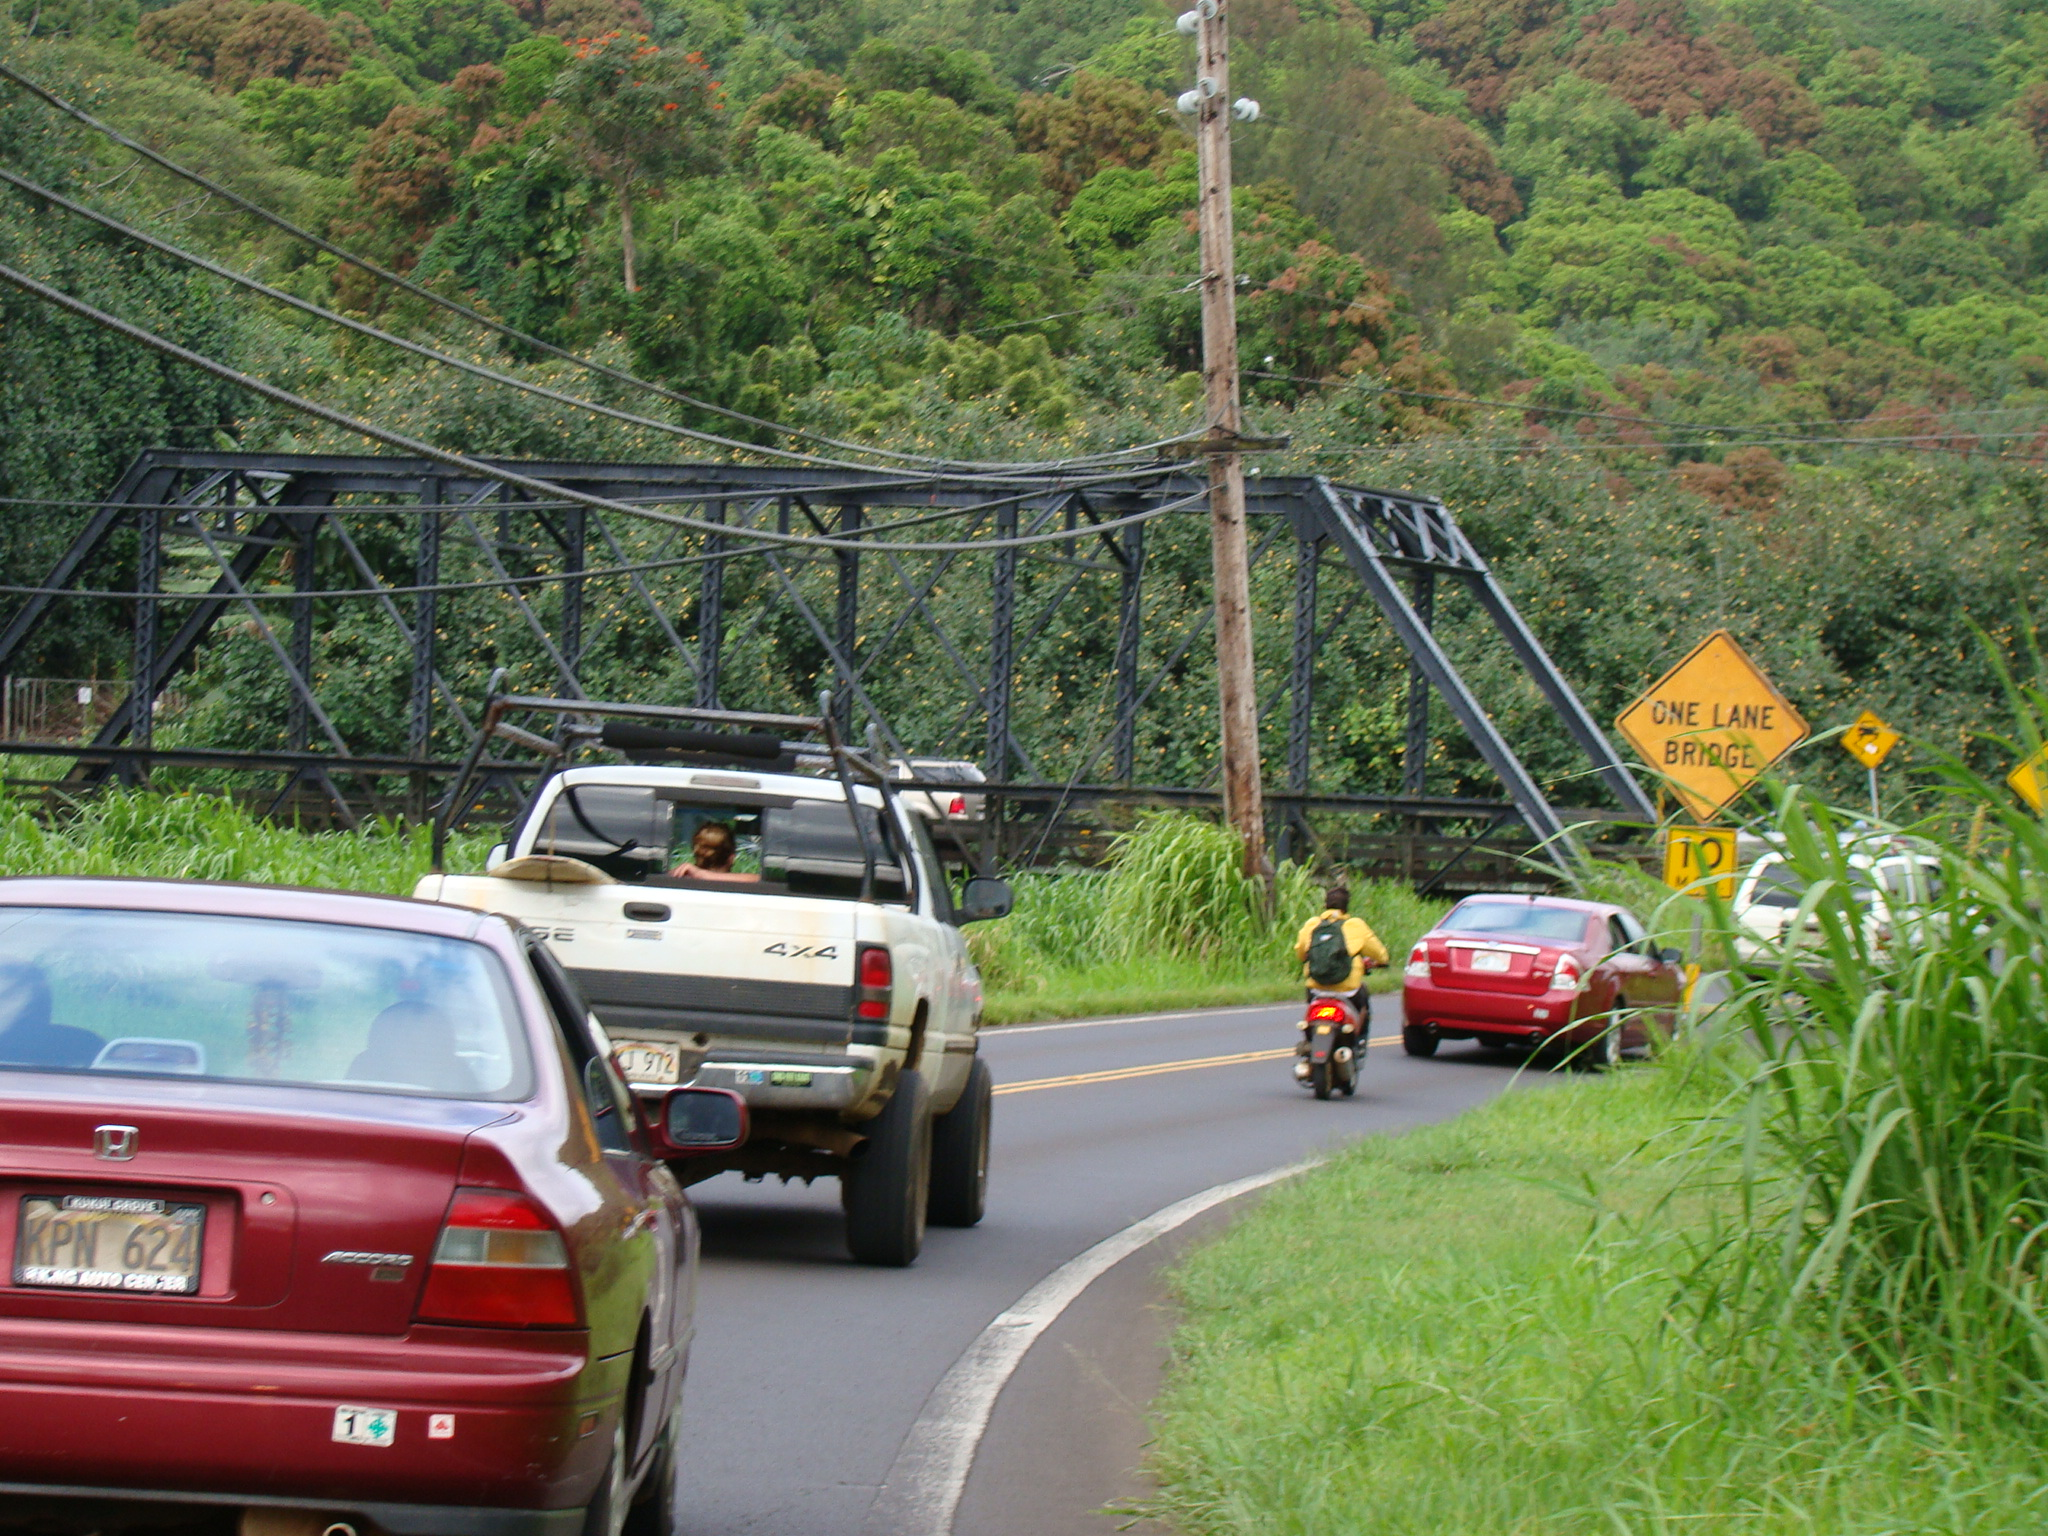 One Lane Bridge Leaving Hanalei